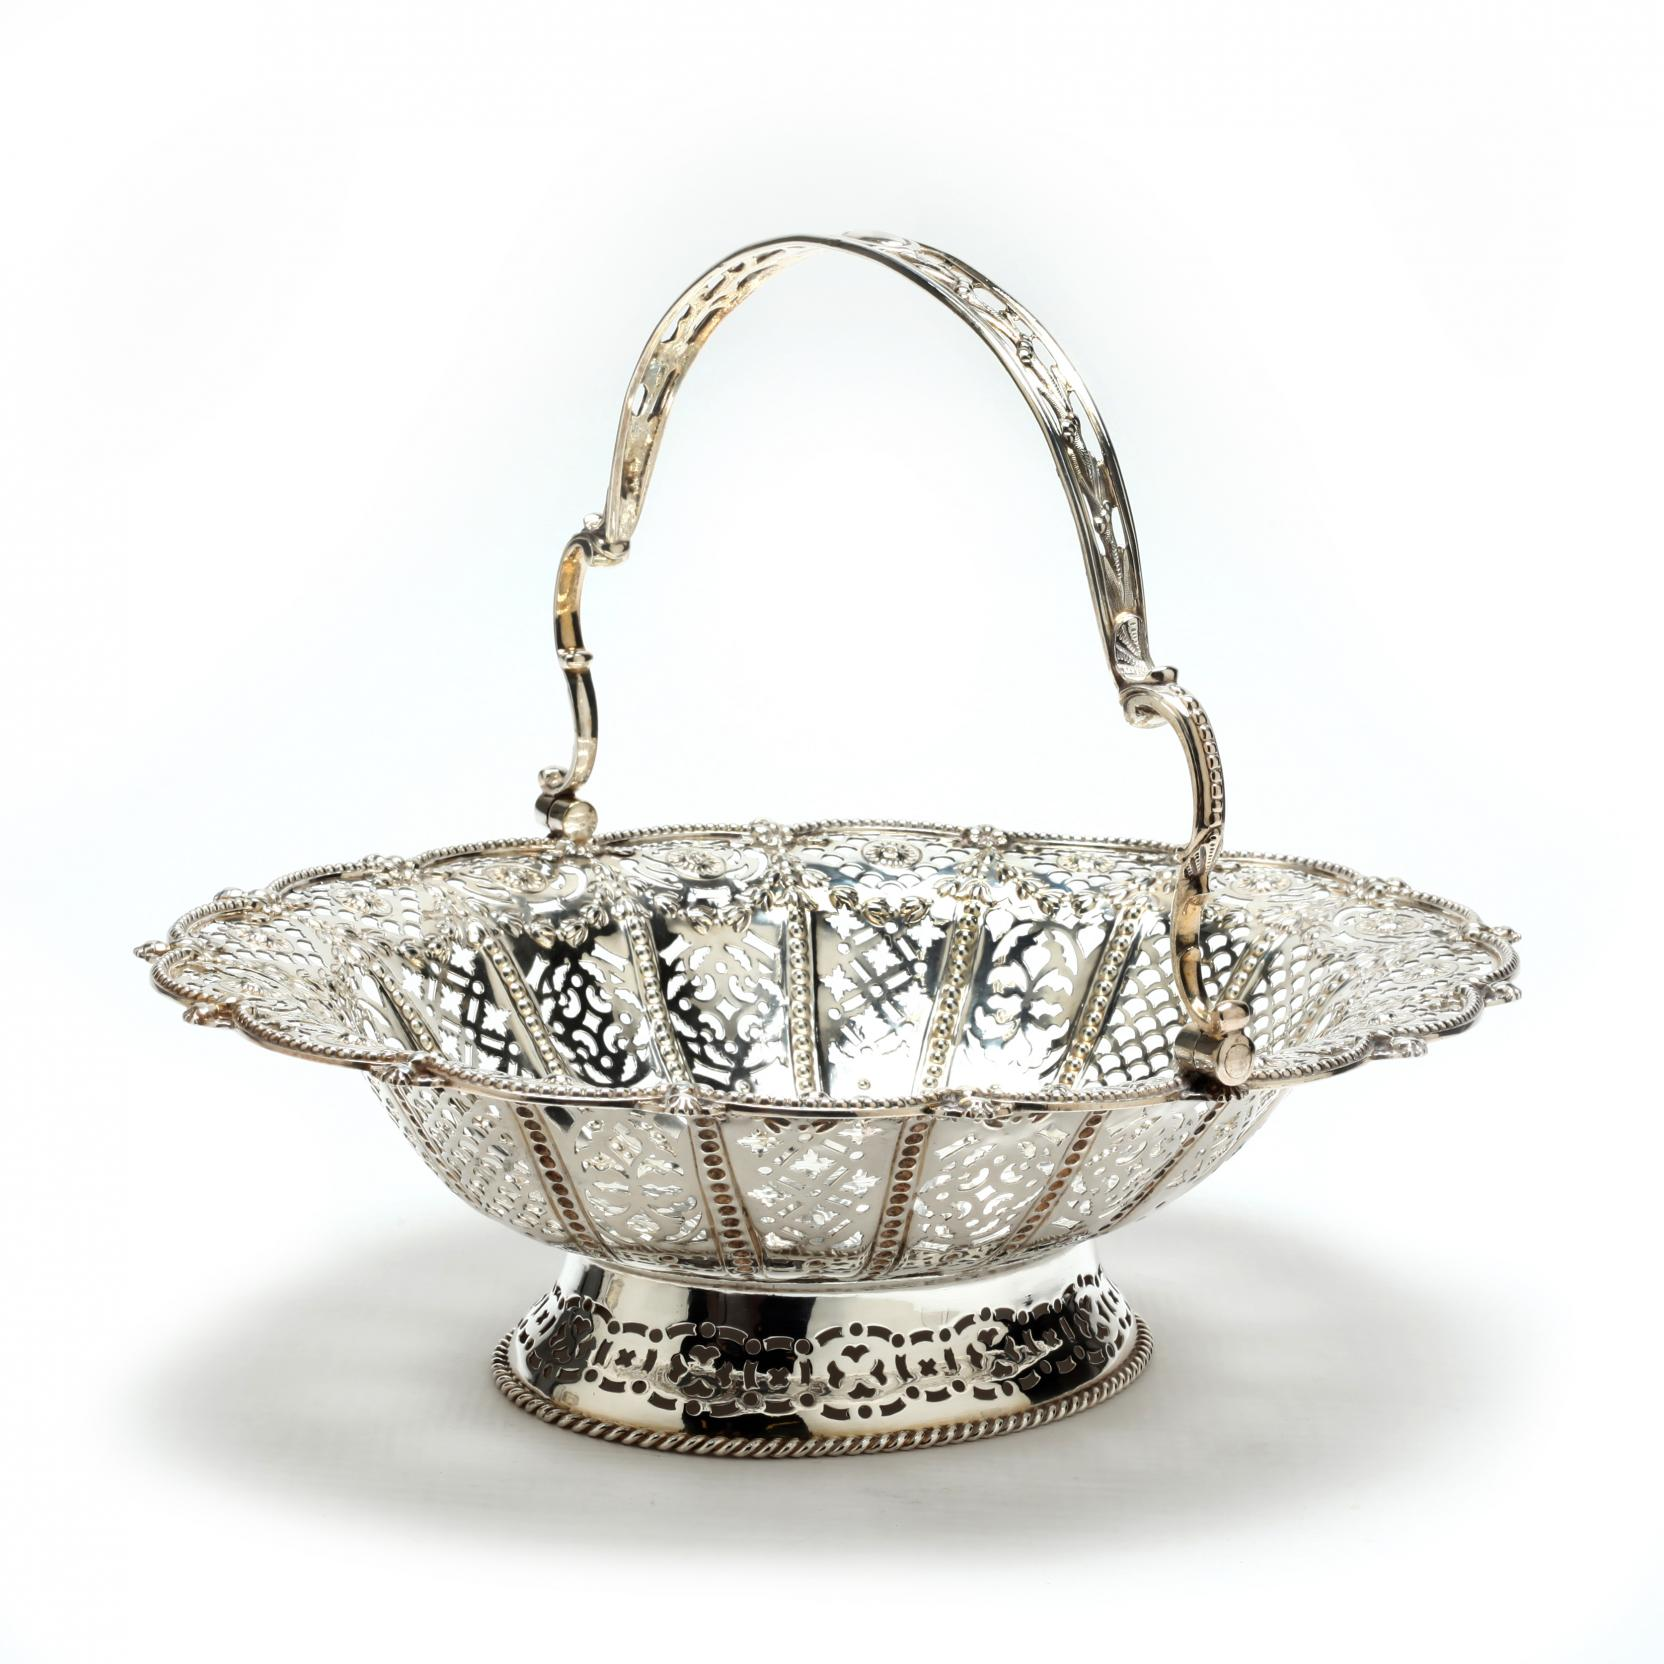 a-victorian-silverplate-cake-basket